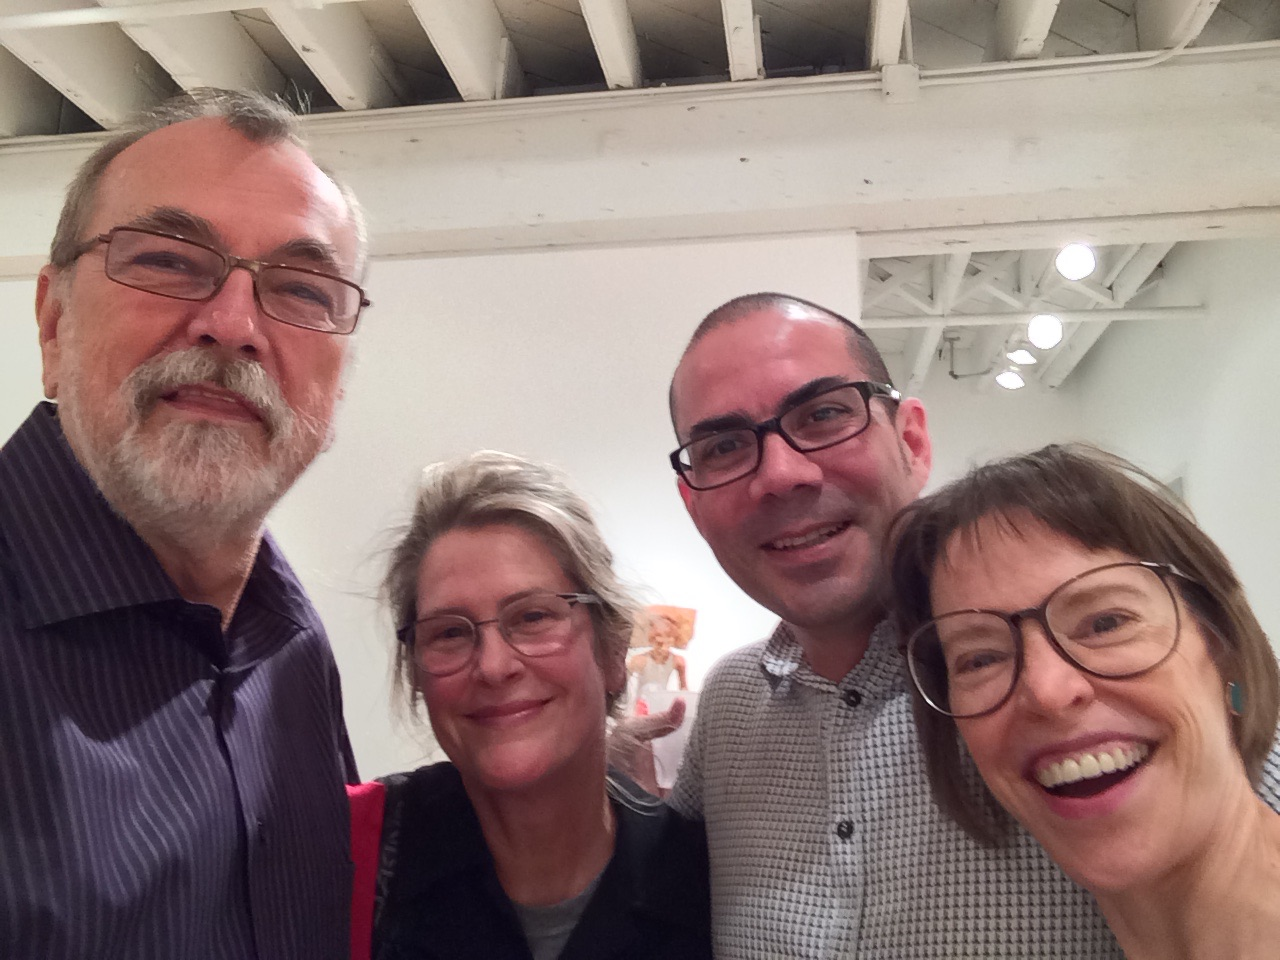 Santiago Cal'sopening at RARE gallery. Great Show, get there!VCU super people ...Joe Seipel, Santiago Cal and Liz King.